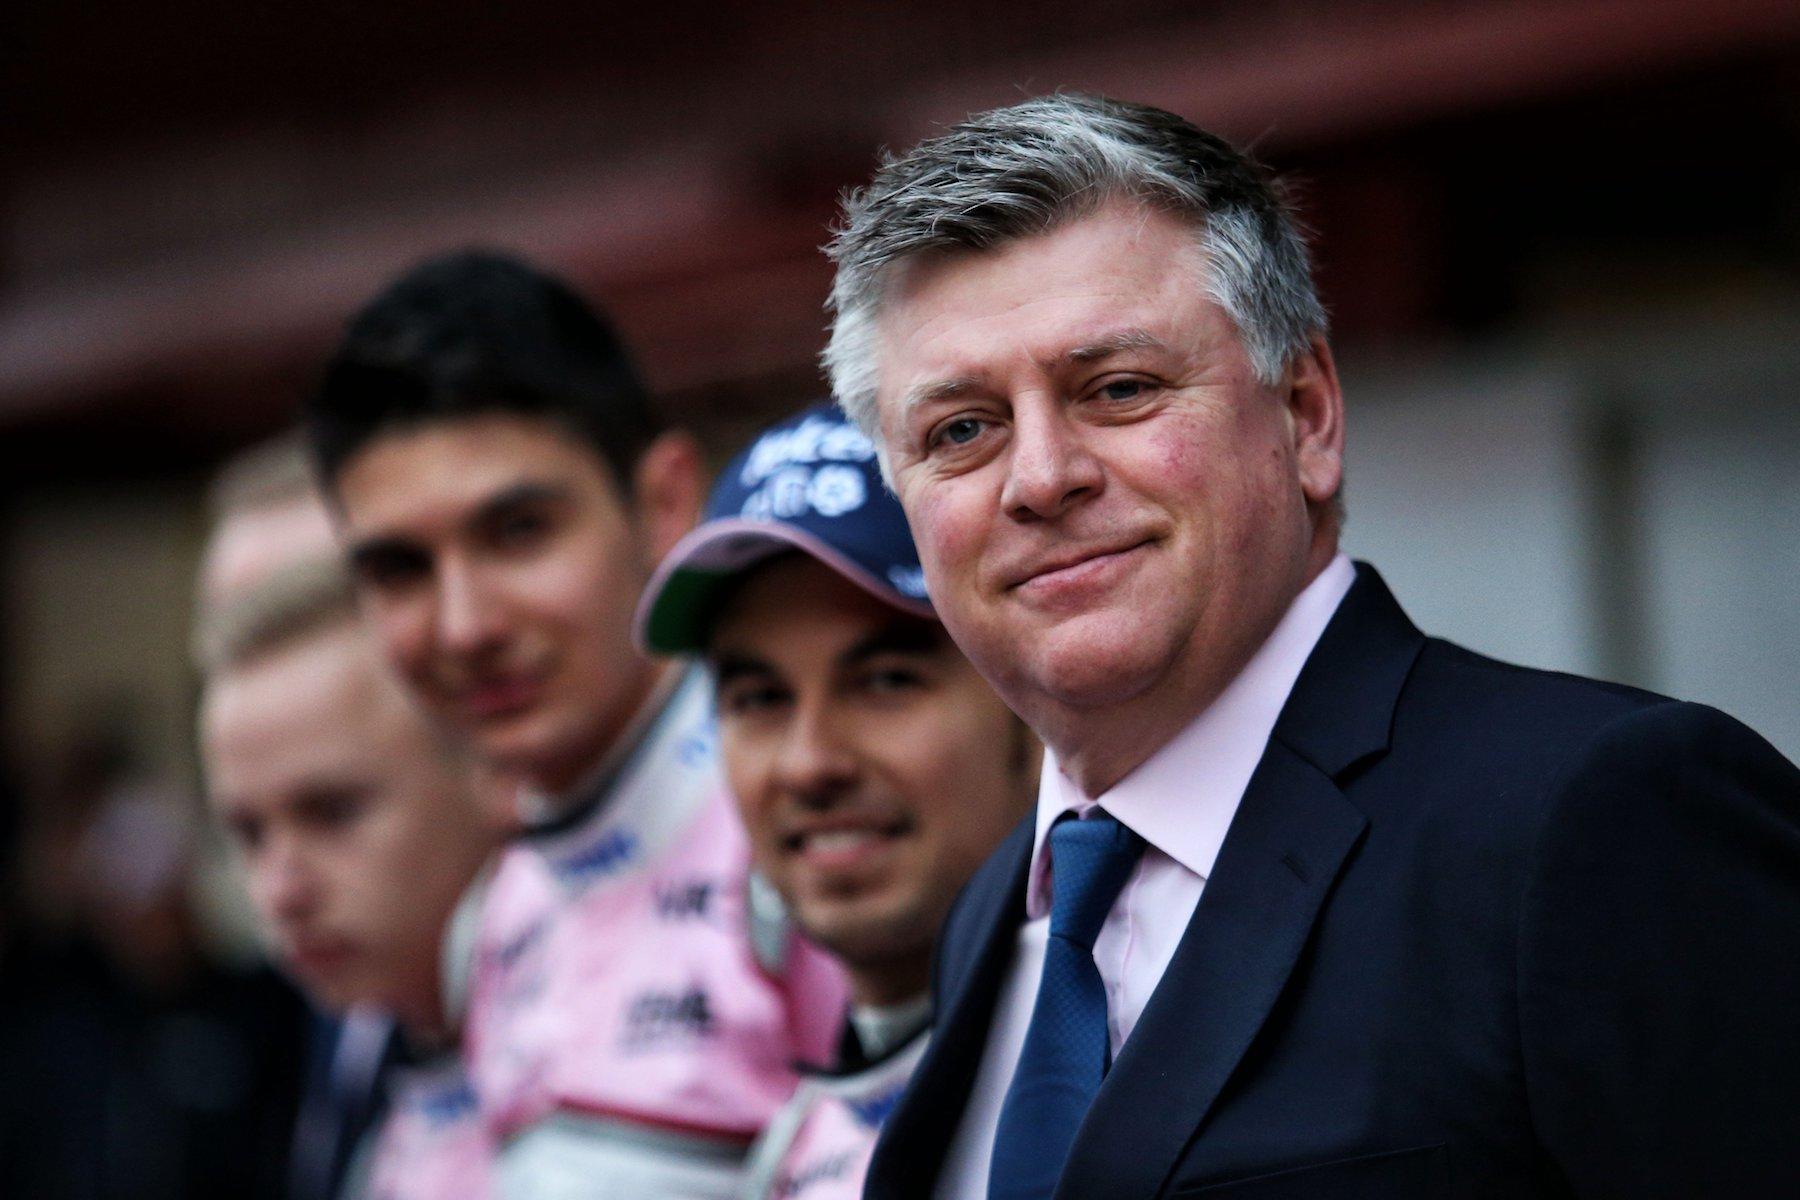 2018 Otmar Szafnauer diventa Team Principal e CEO di Racing Point Force India F1. copy 2.jpeg